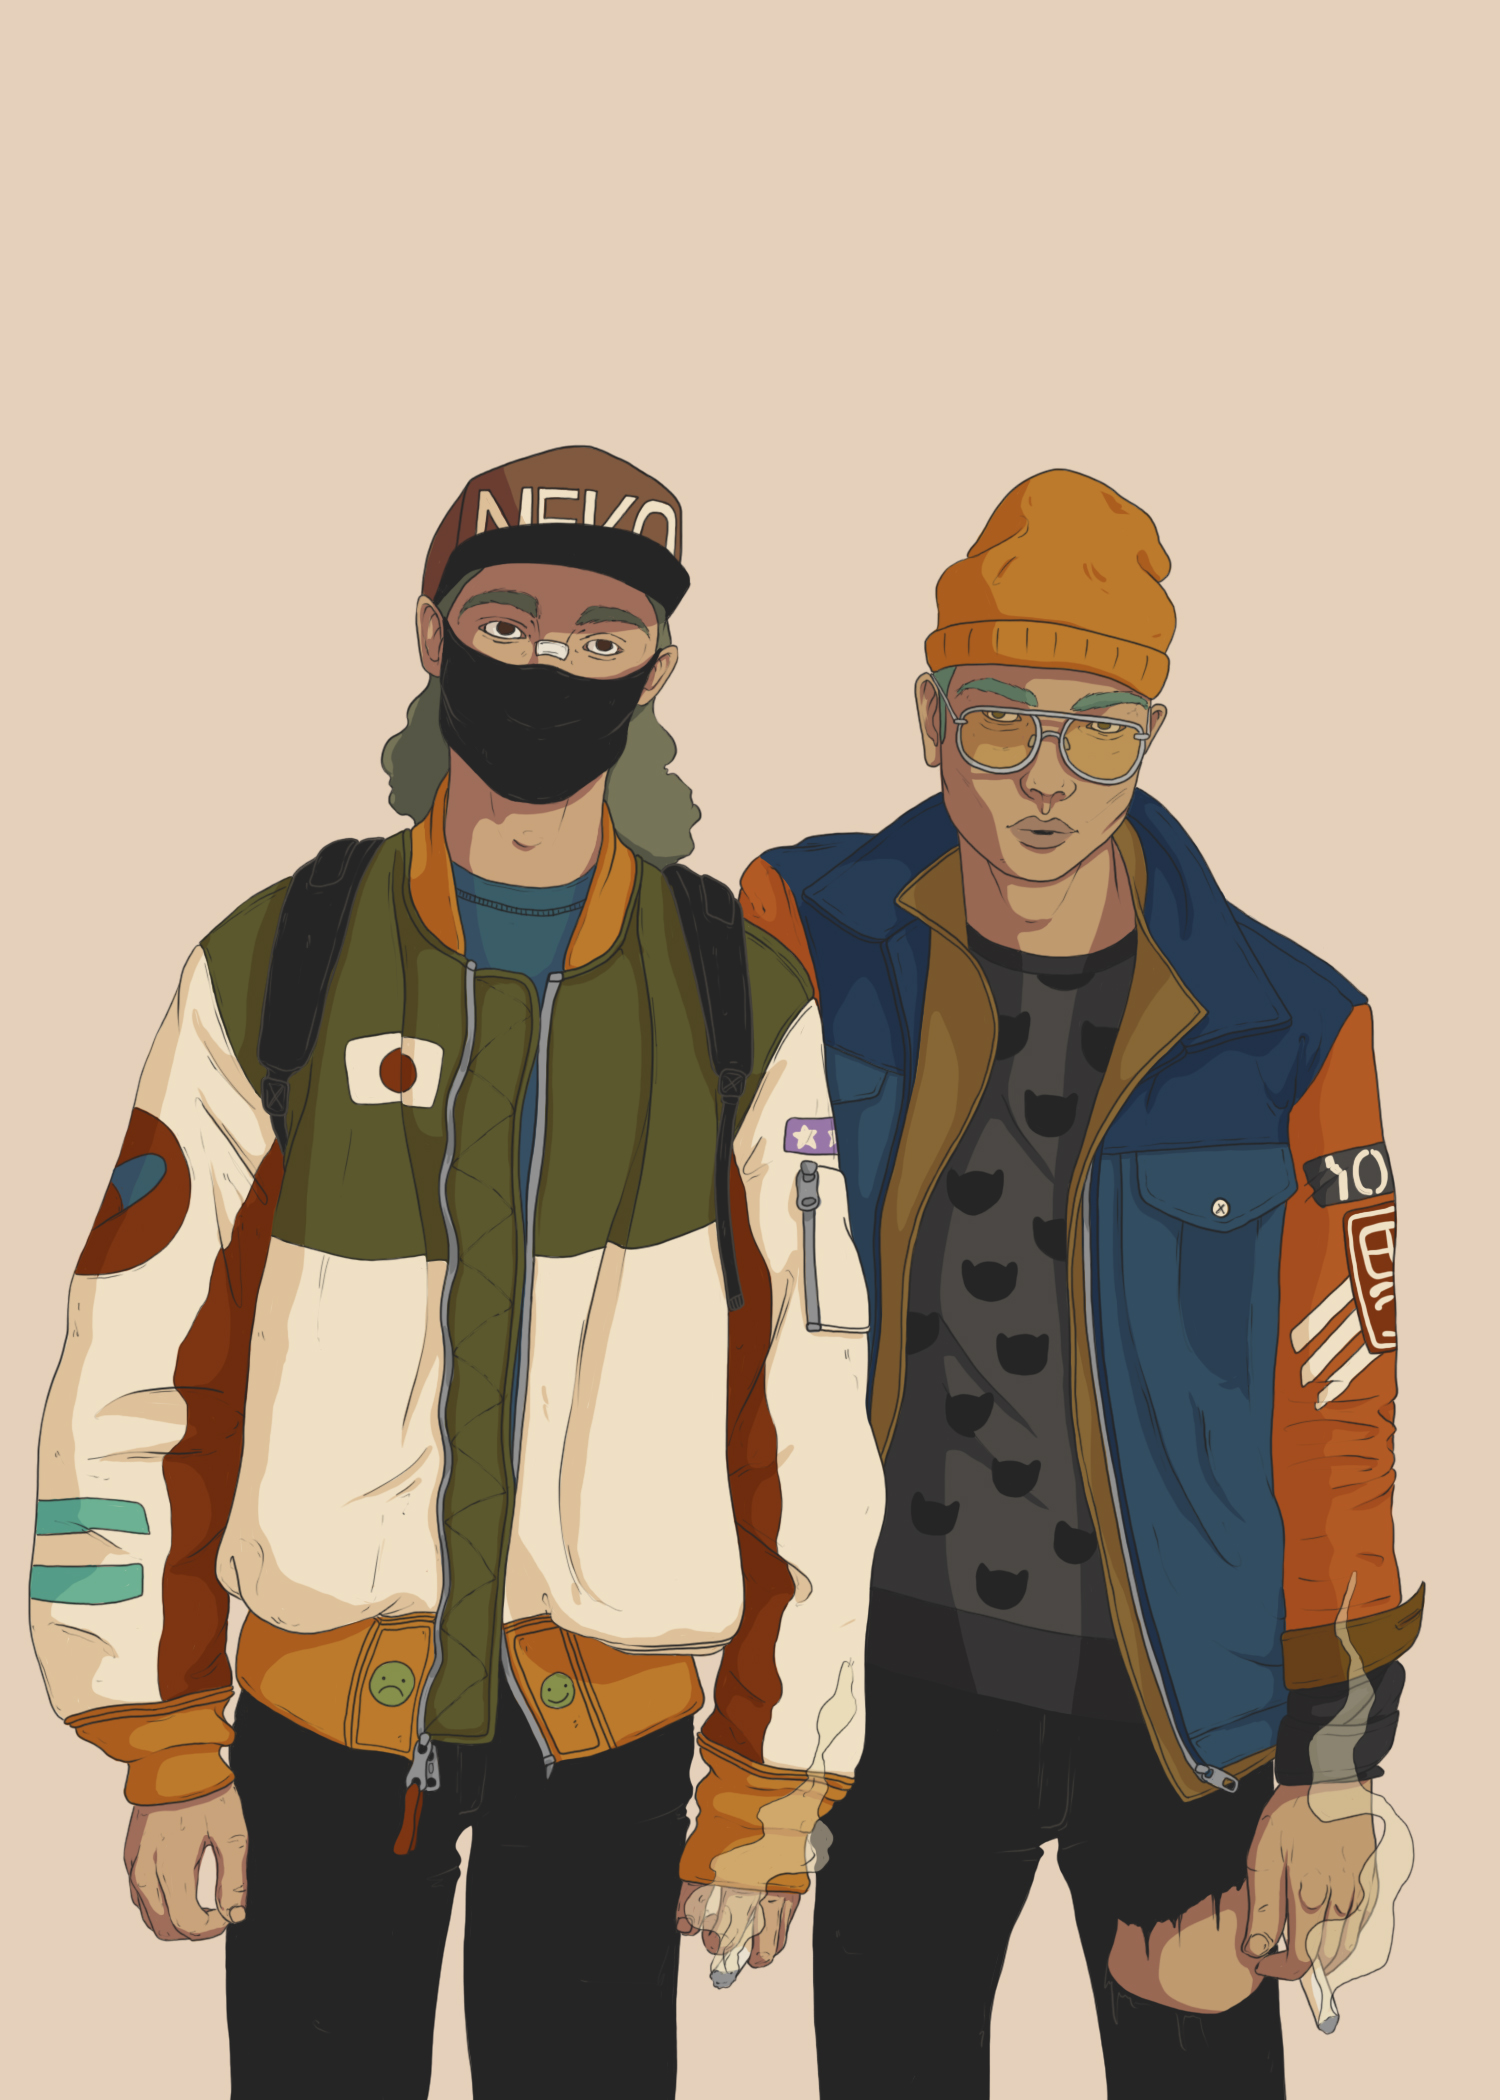 Neko twins